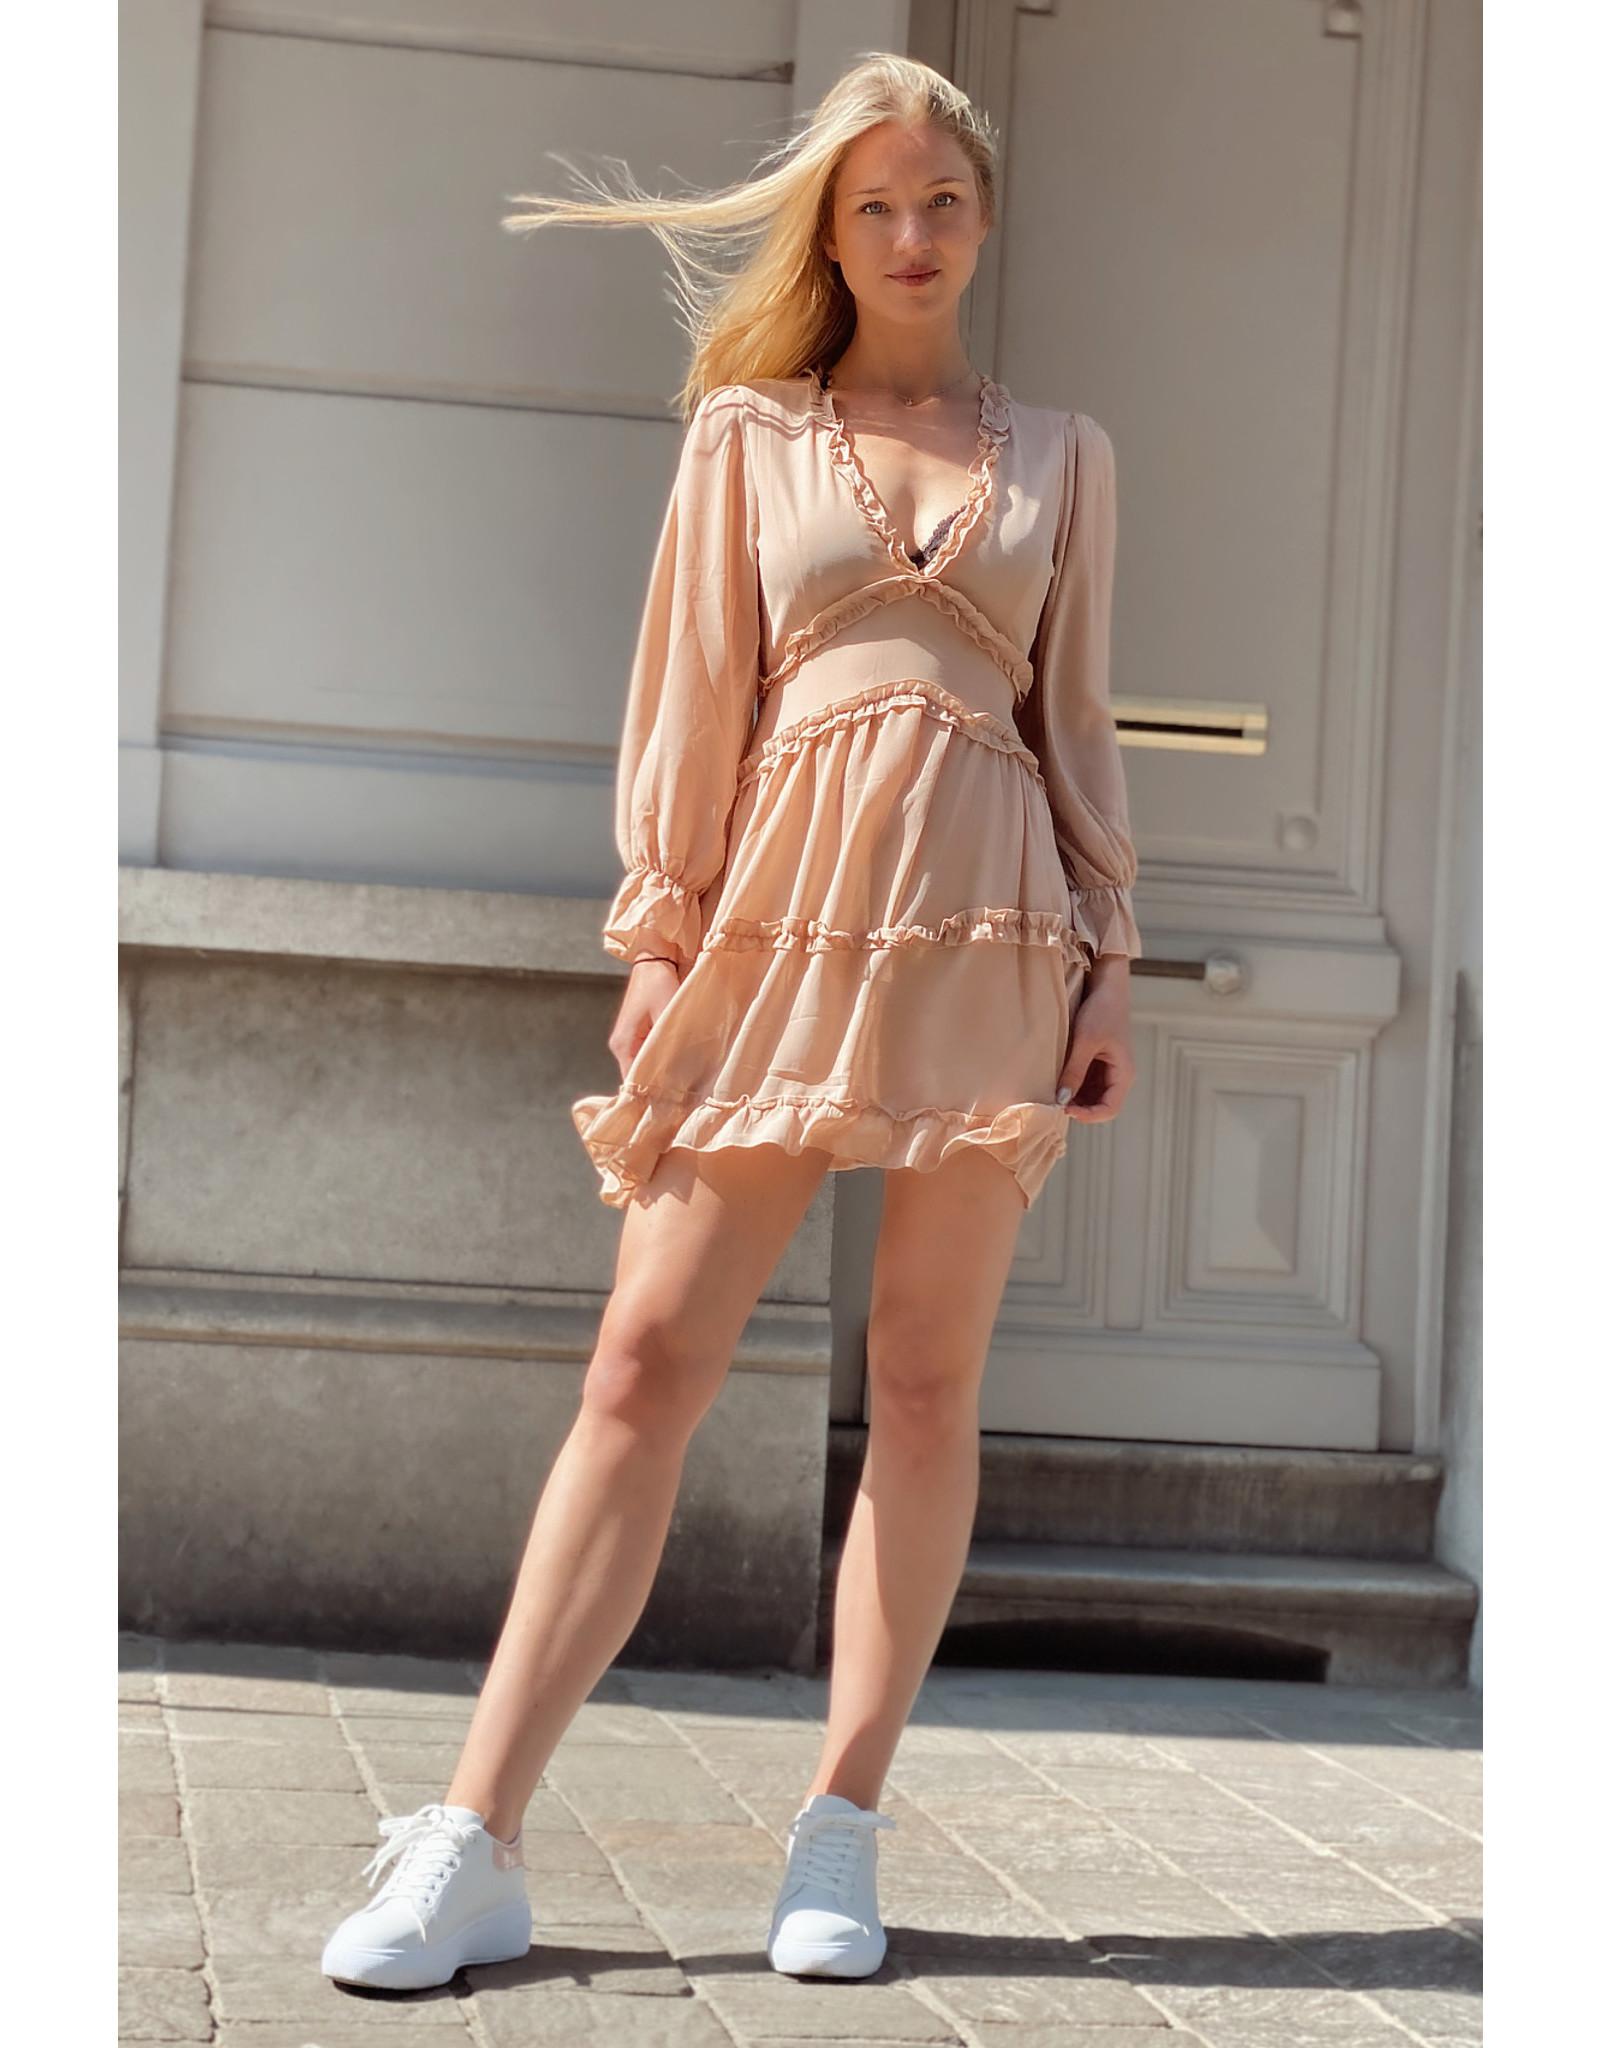 Paris Cute Nude Dress